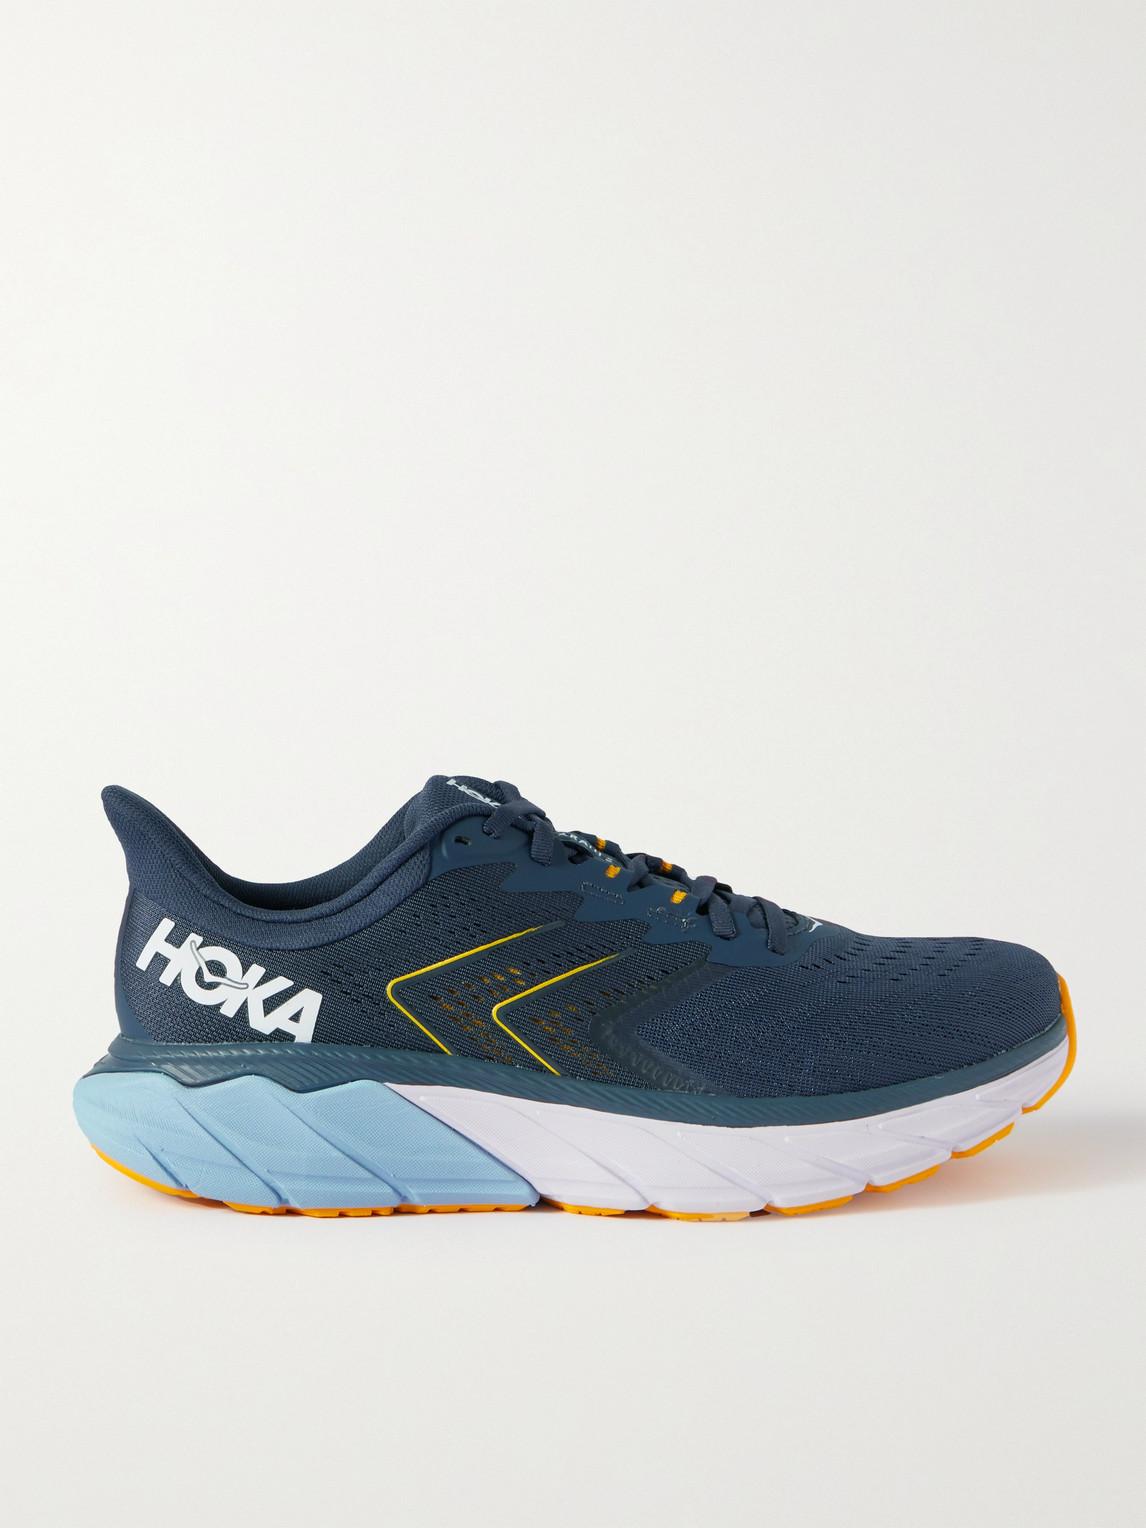 Hoka One One Shoes ARAHI 5 RUBBER-TRIMMED MESH RUNNING SNEAKERS